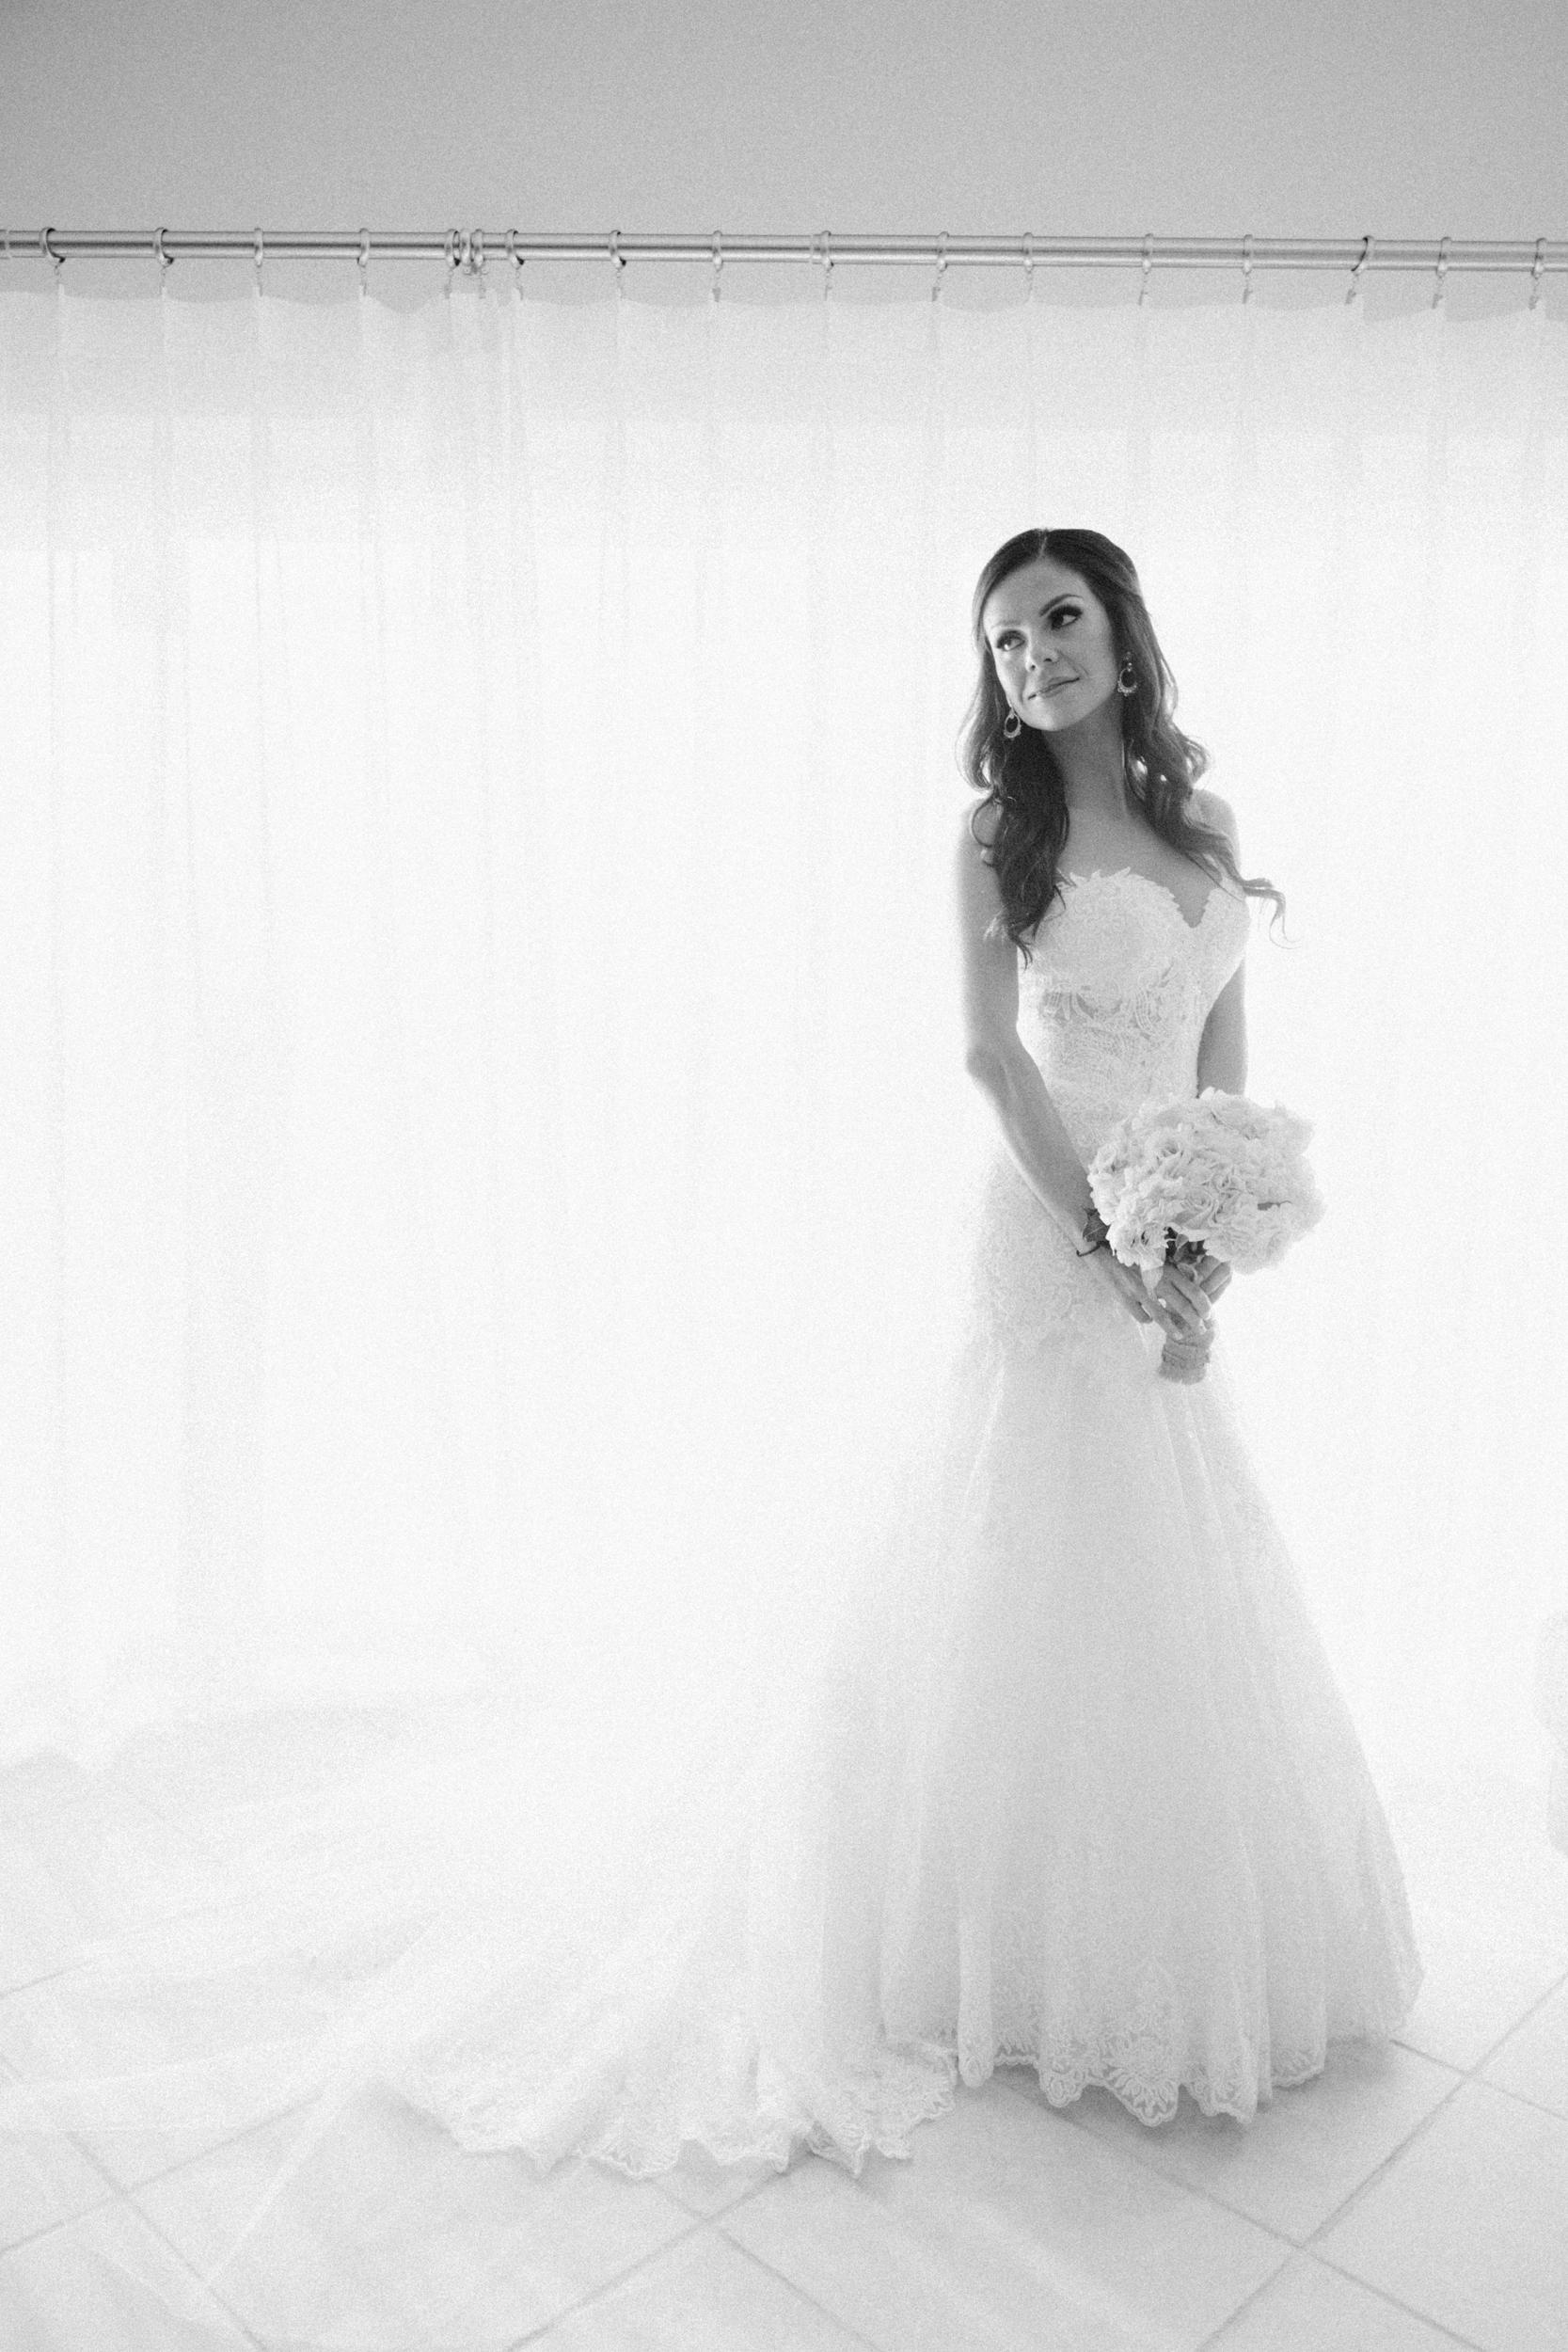 Amethyst Weddings - Georgi and Mariana 042.jpg